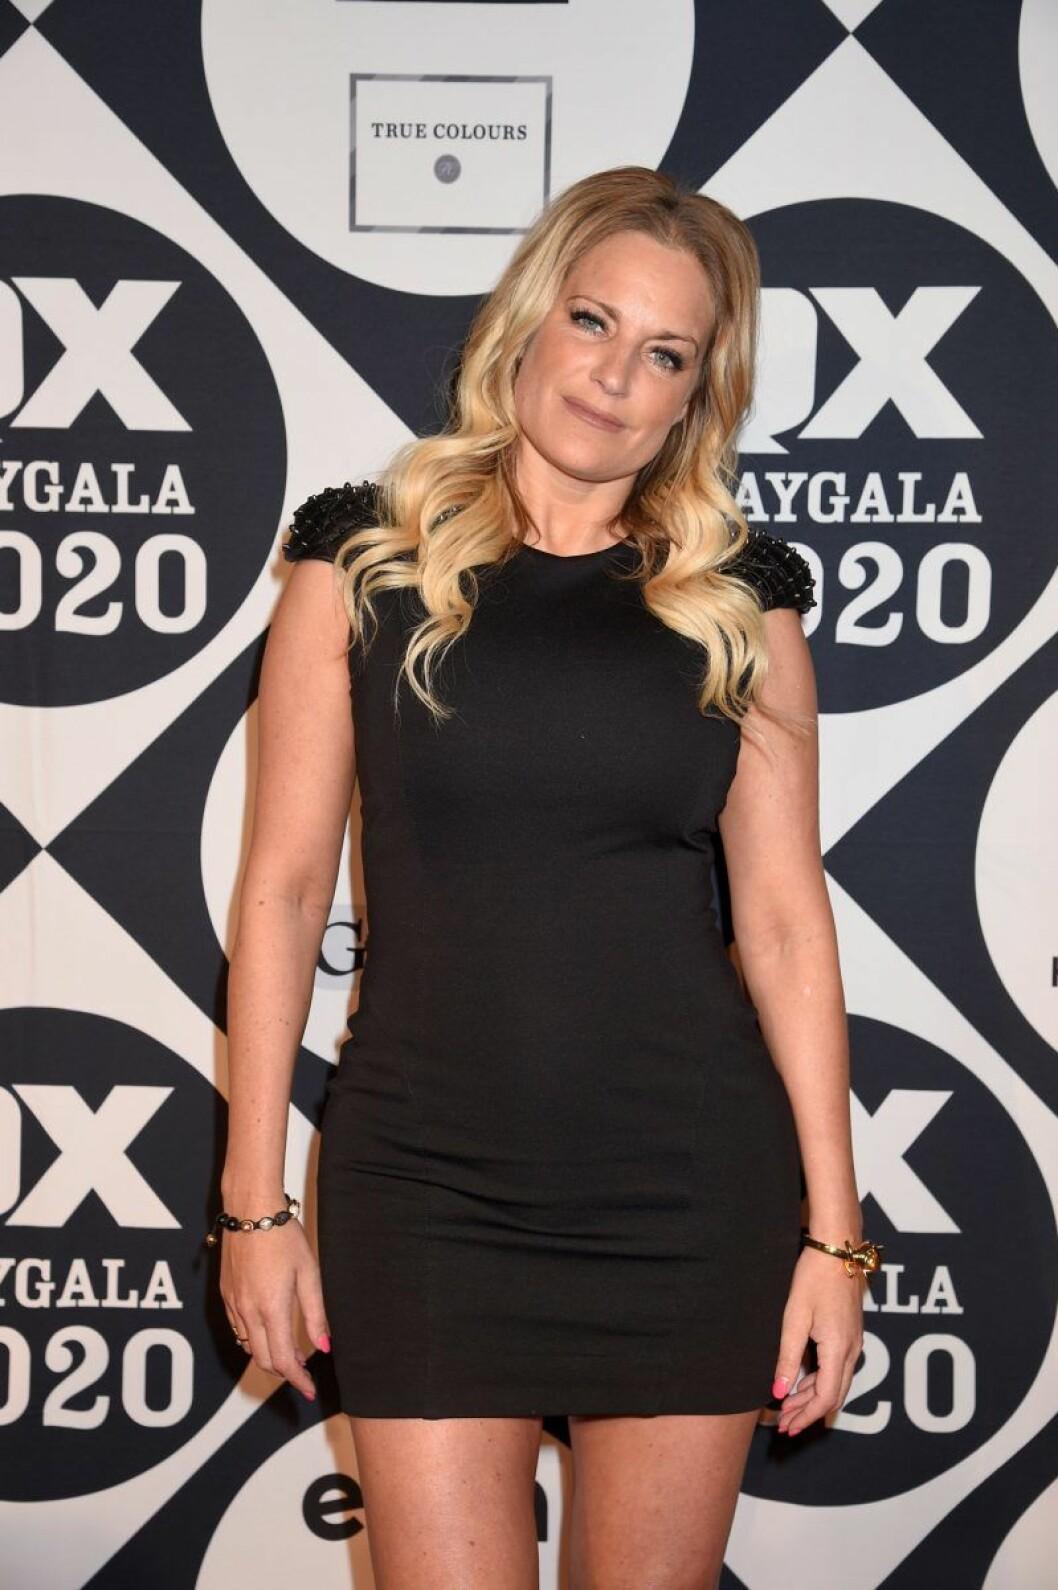 Laila Bagge på röda mattan på QX-galan 2020